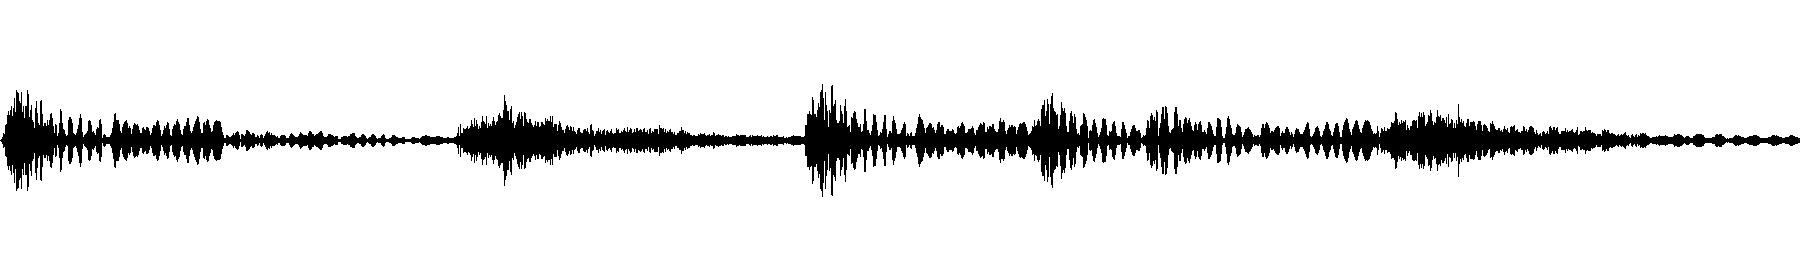 vaporization loop 1